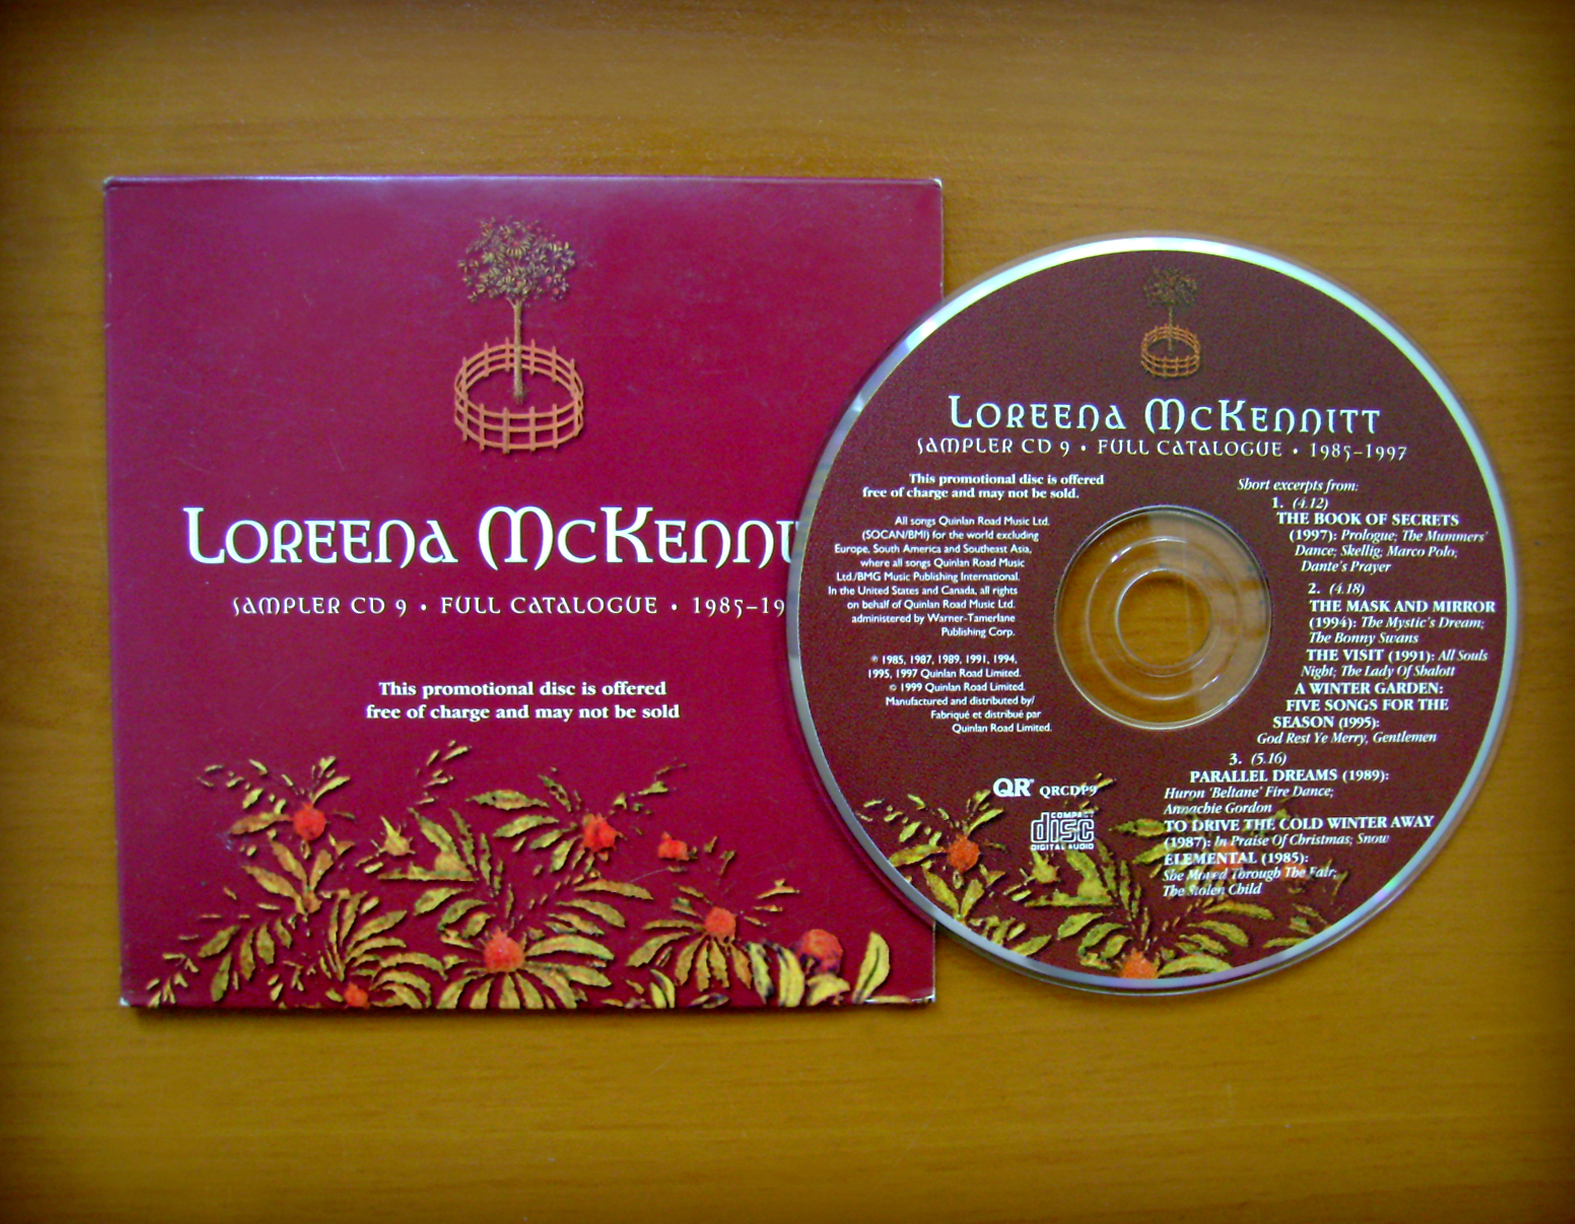 loreena mckennitt collection 1999 u2013 sampler cd 9 full catalogue